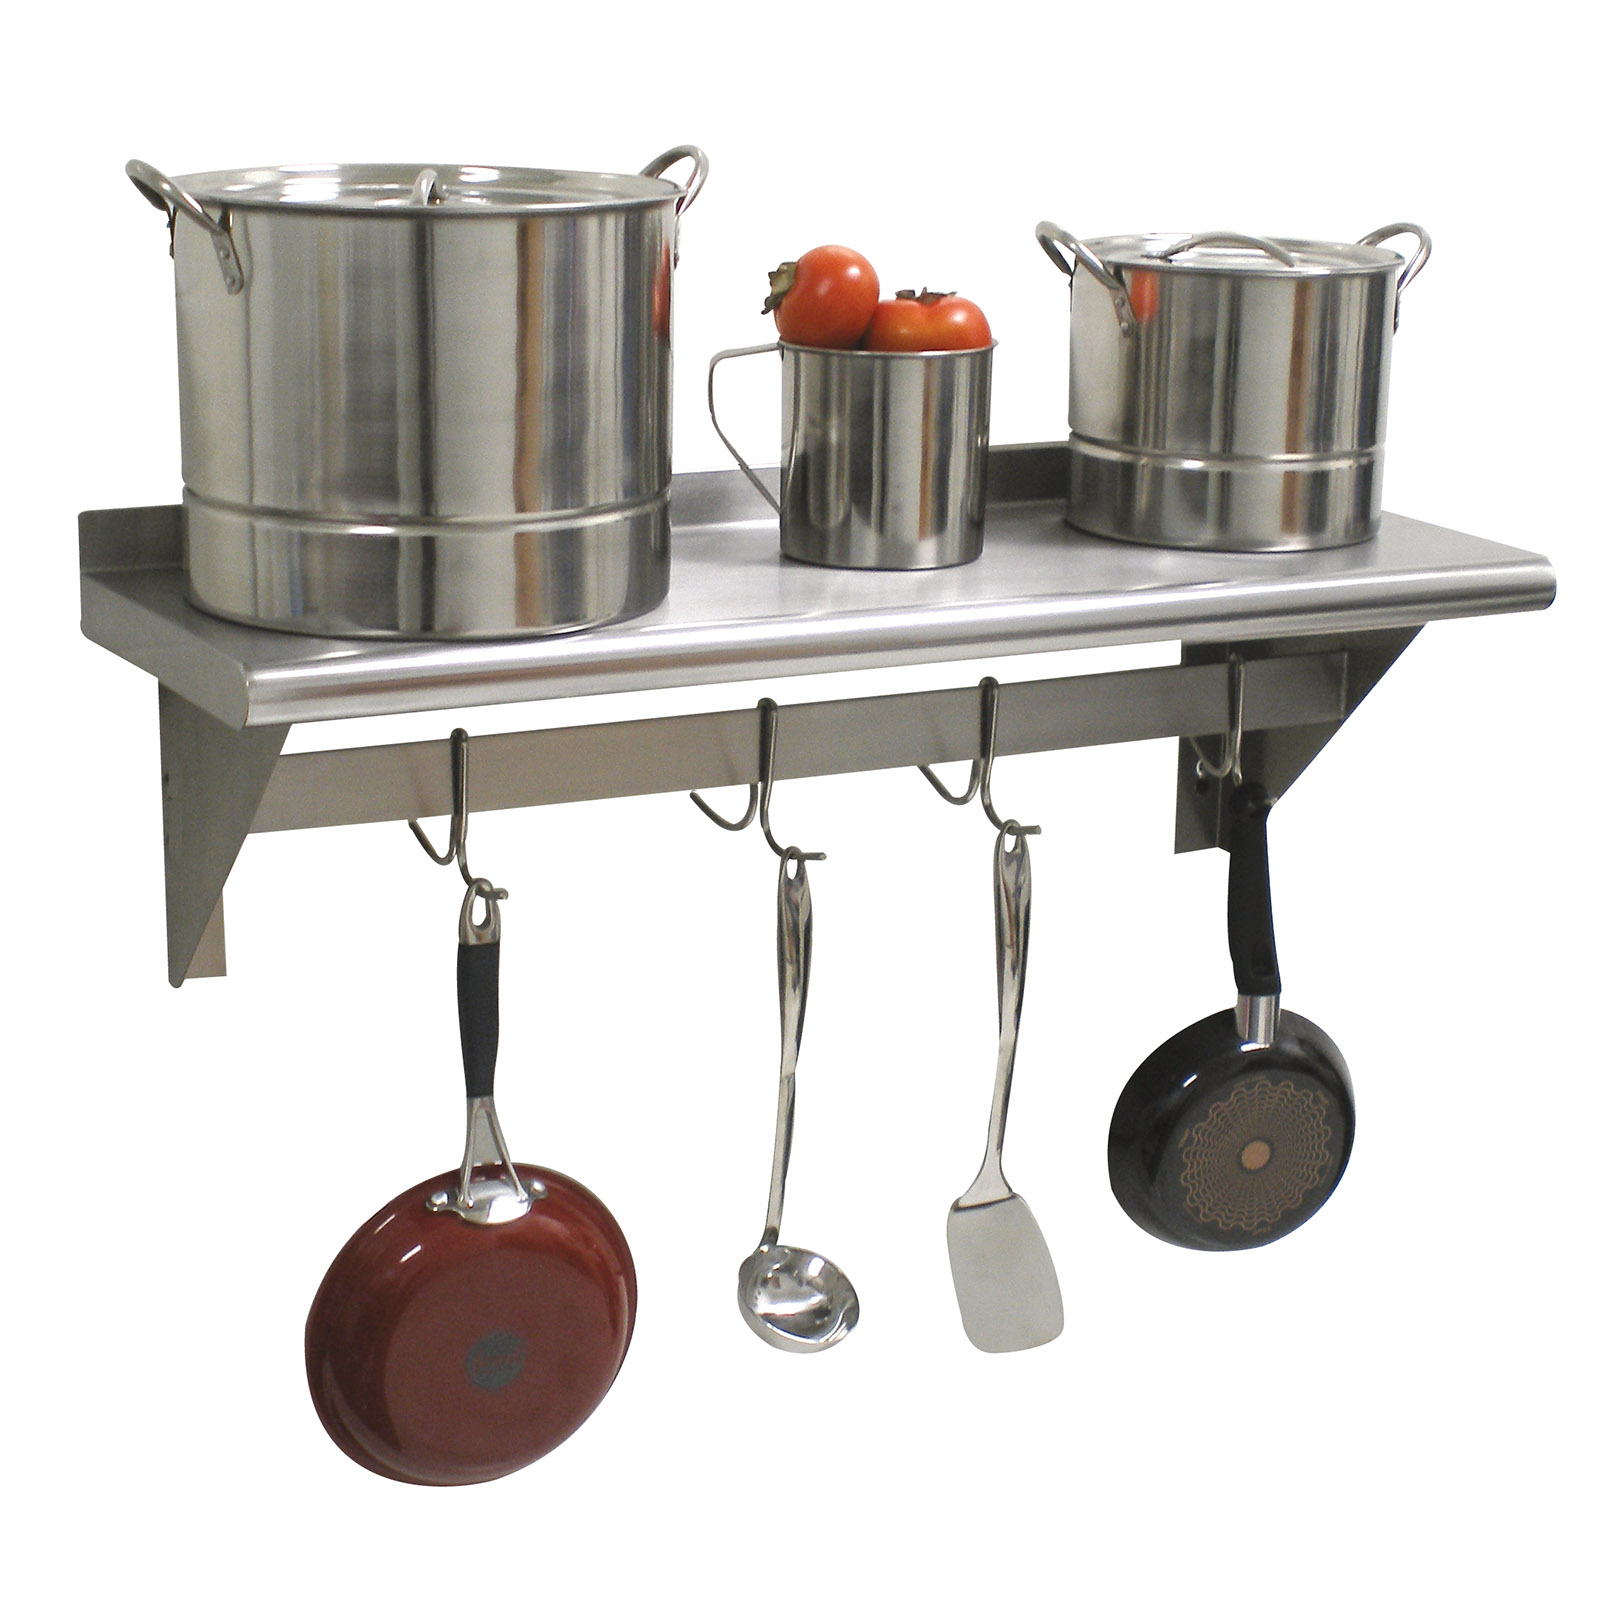 Advance Tabco PS-15-120 overshelf, wall-mounted with pot rack